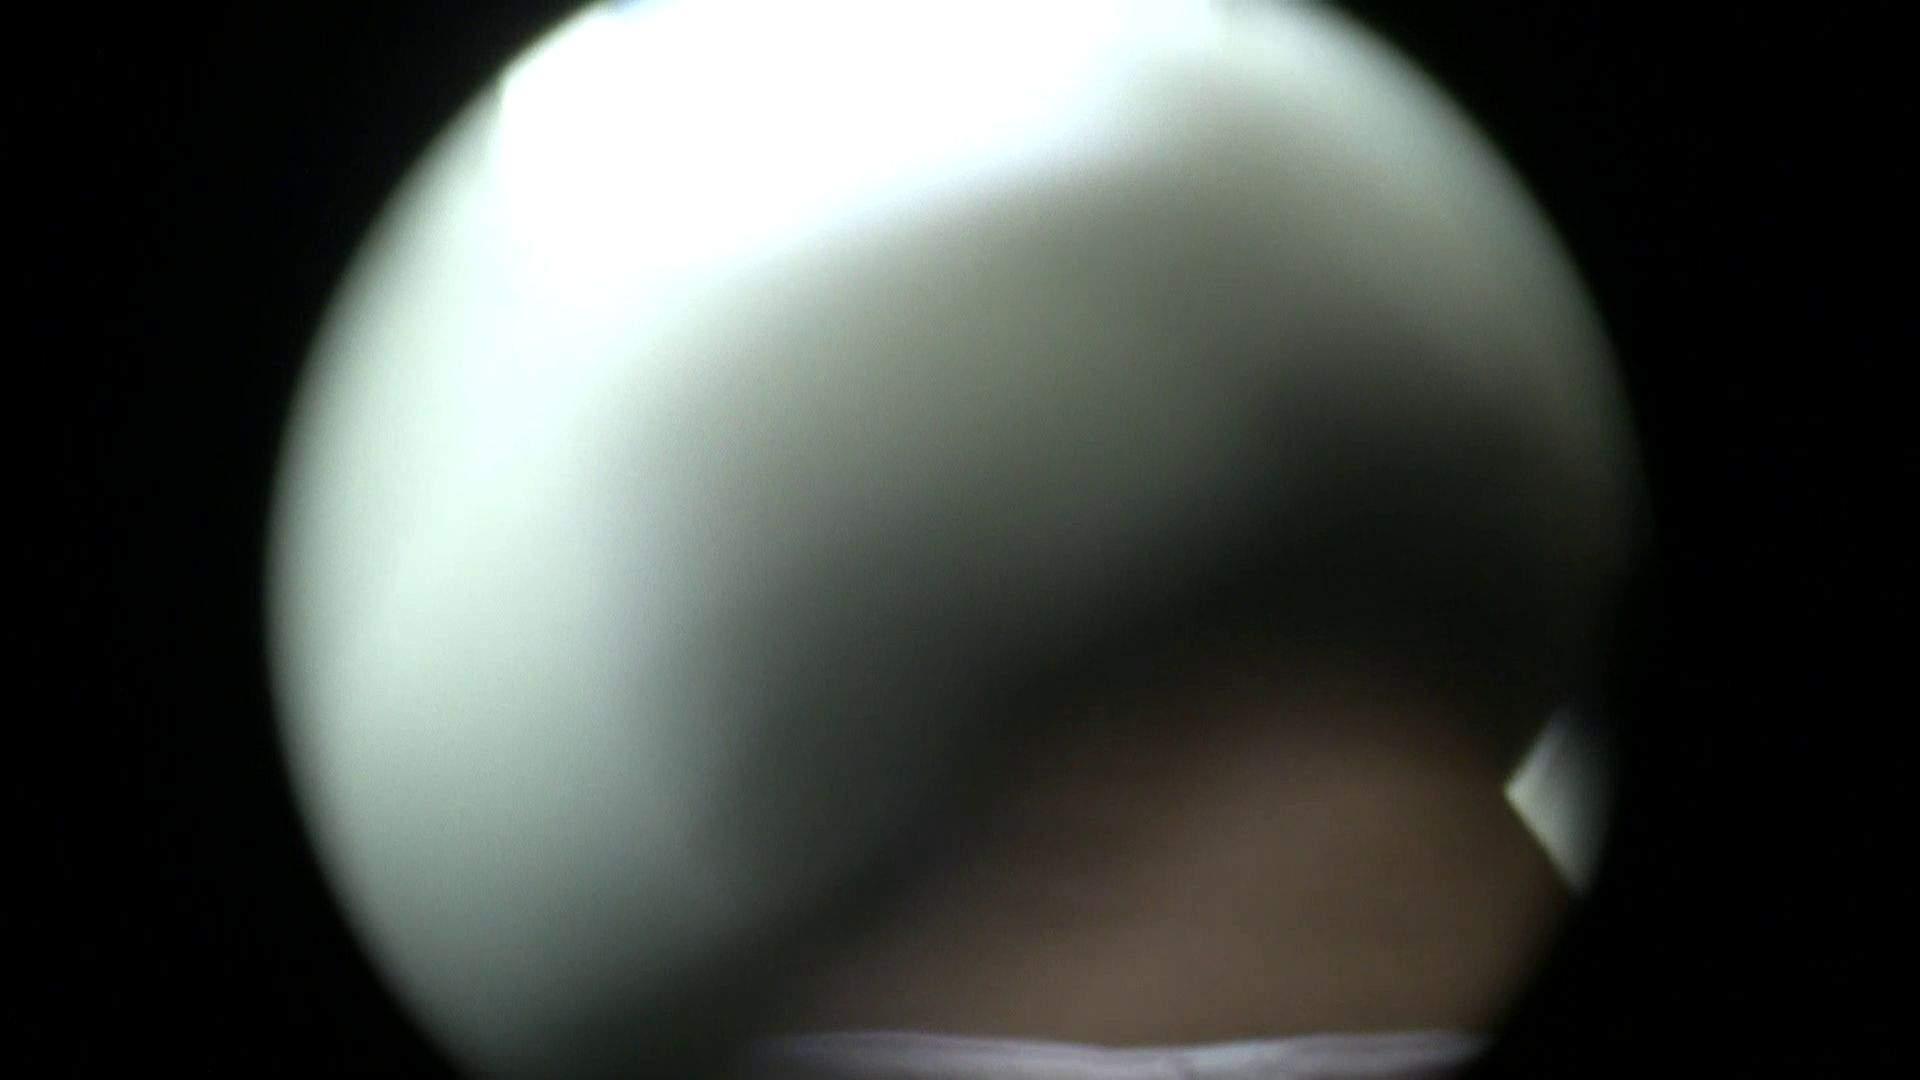 NO.29 胸腹すべてがダイナマイト!! シャワー室 AV無料動画キャプチャ 99枚 98